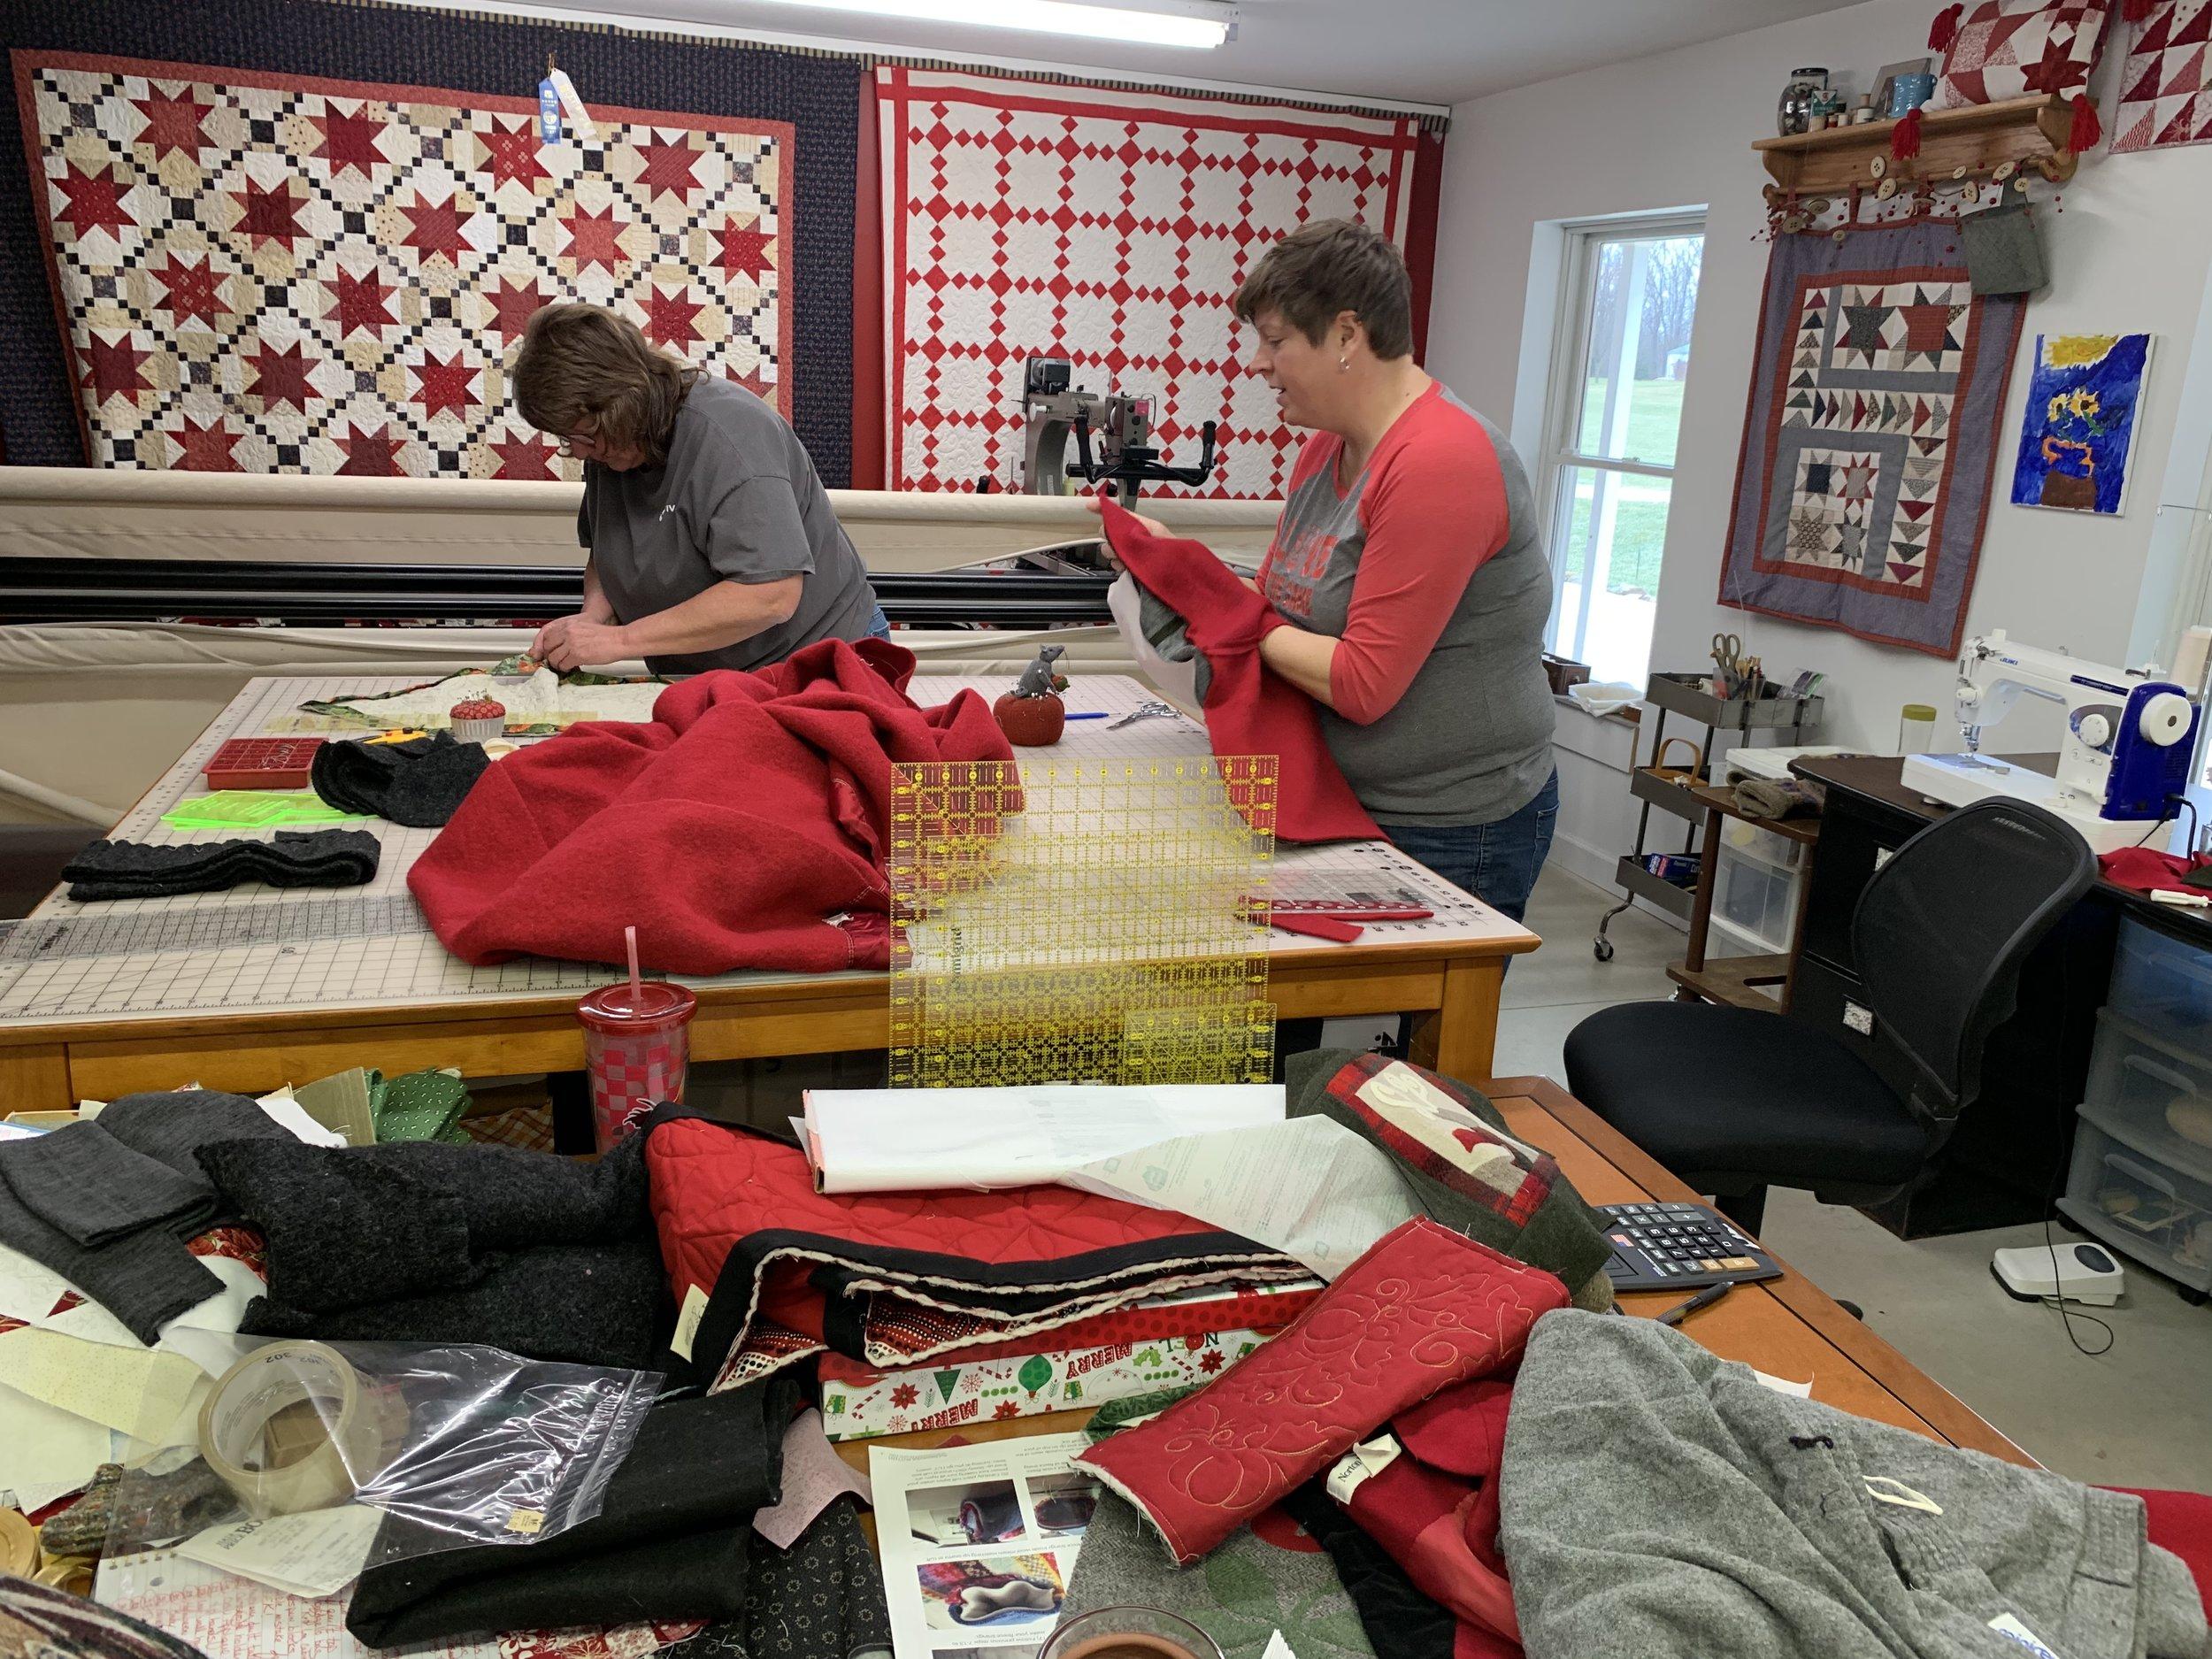 Inside the quilt studio